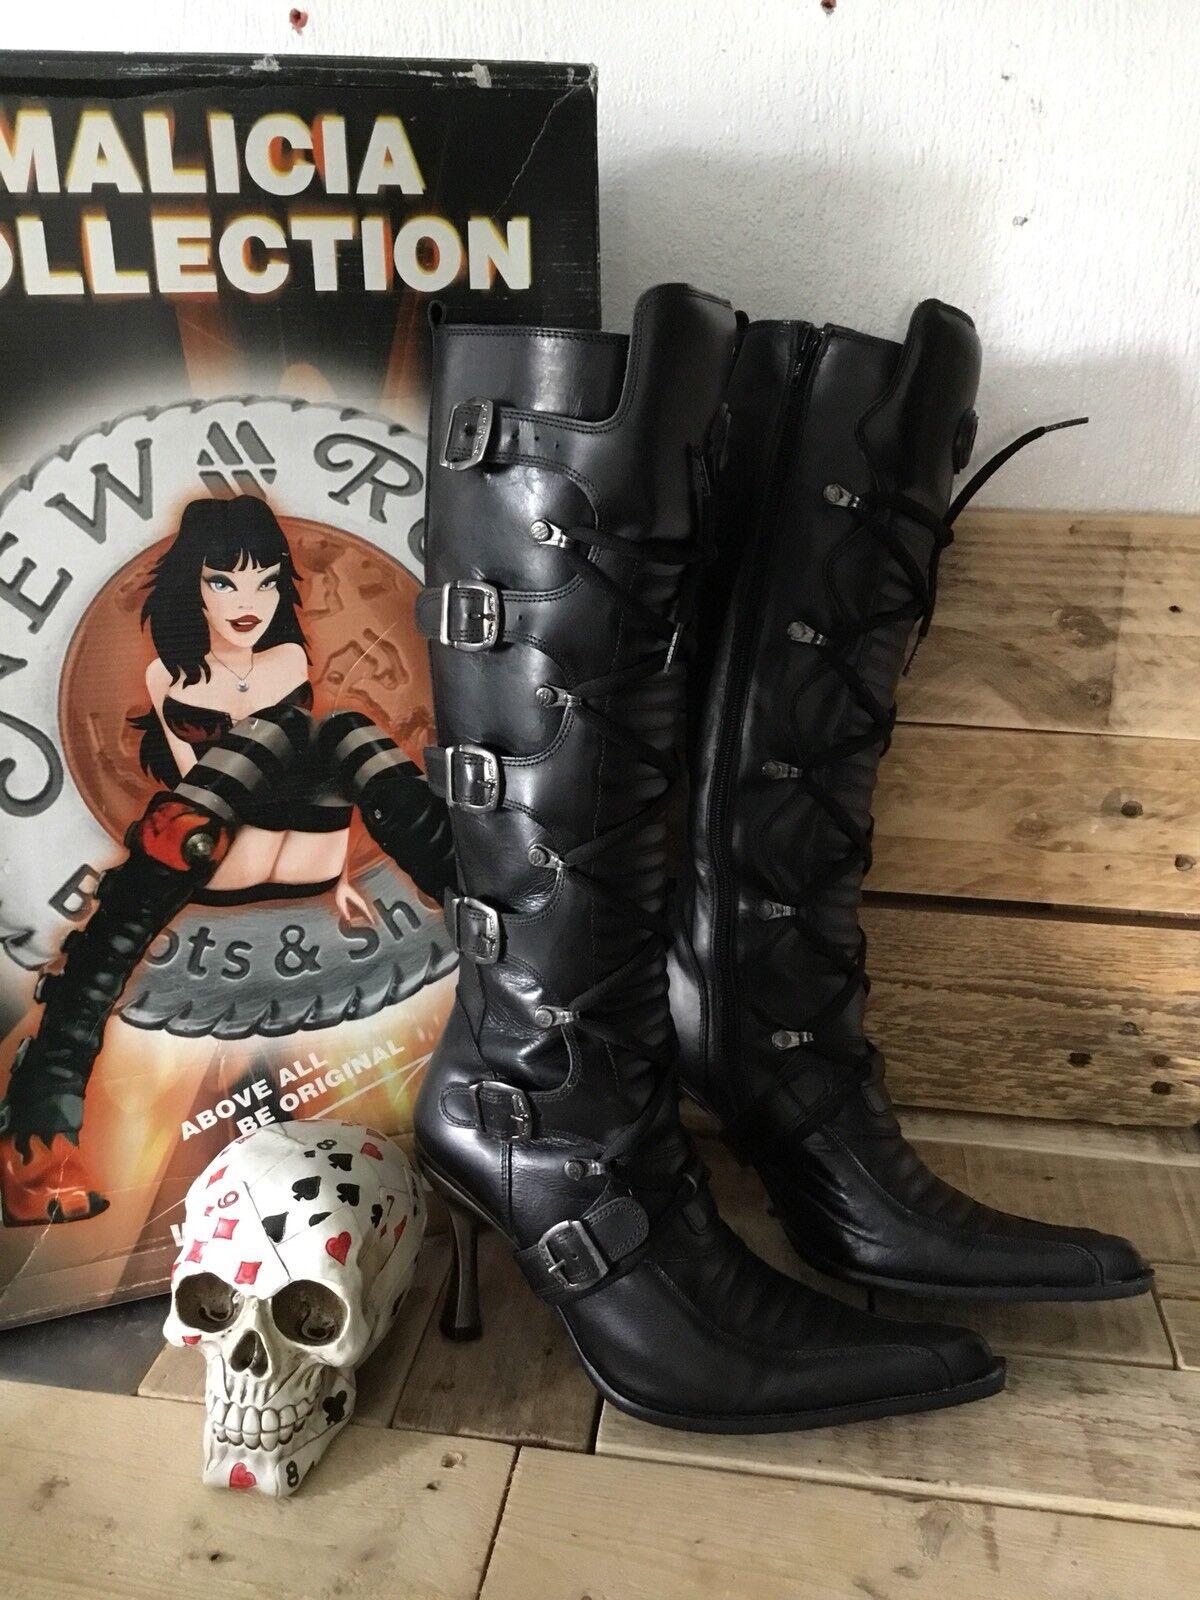 Zapatos especiales con descuento New Rock Ladies Boots Malicia Collection Boxed Size 5.5 Euro 38 Stiletto Shoes